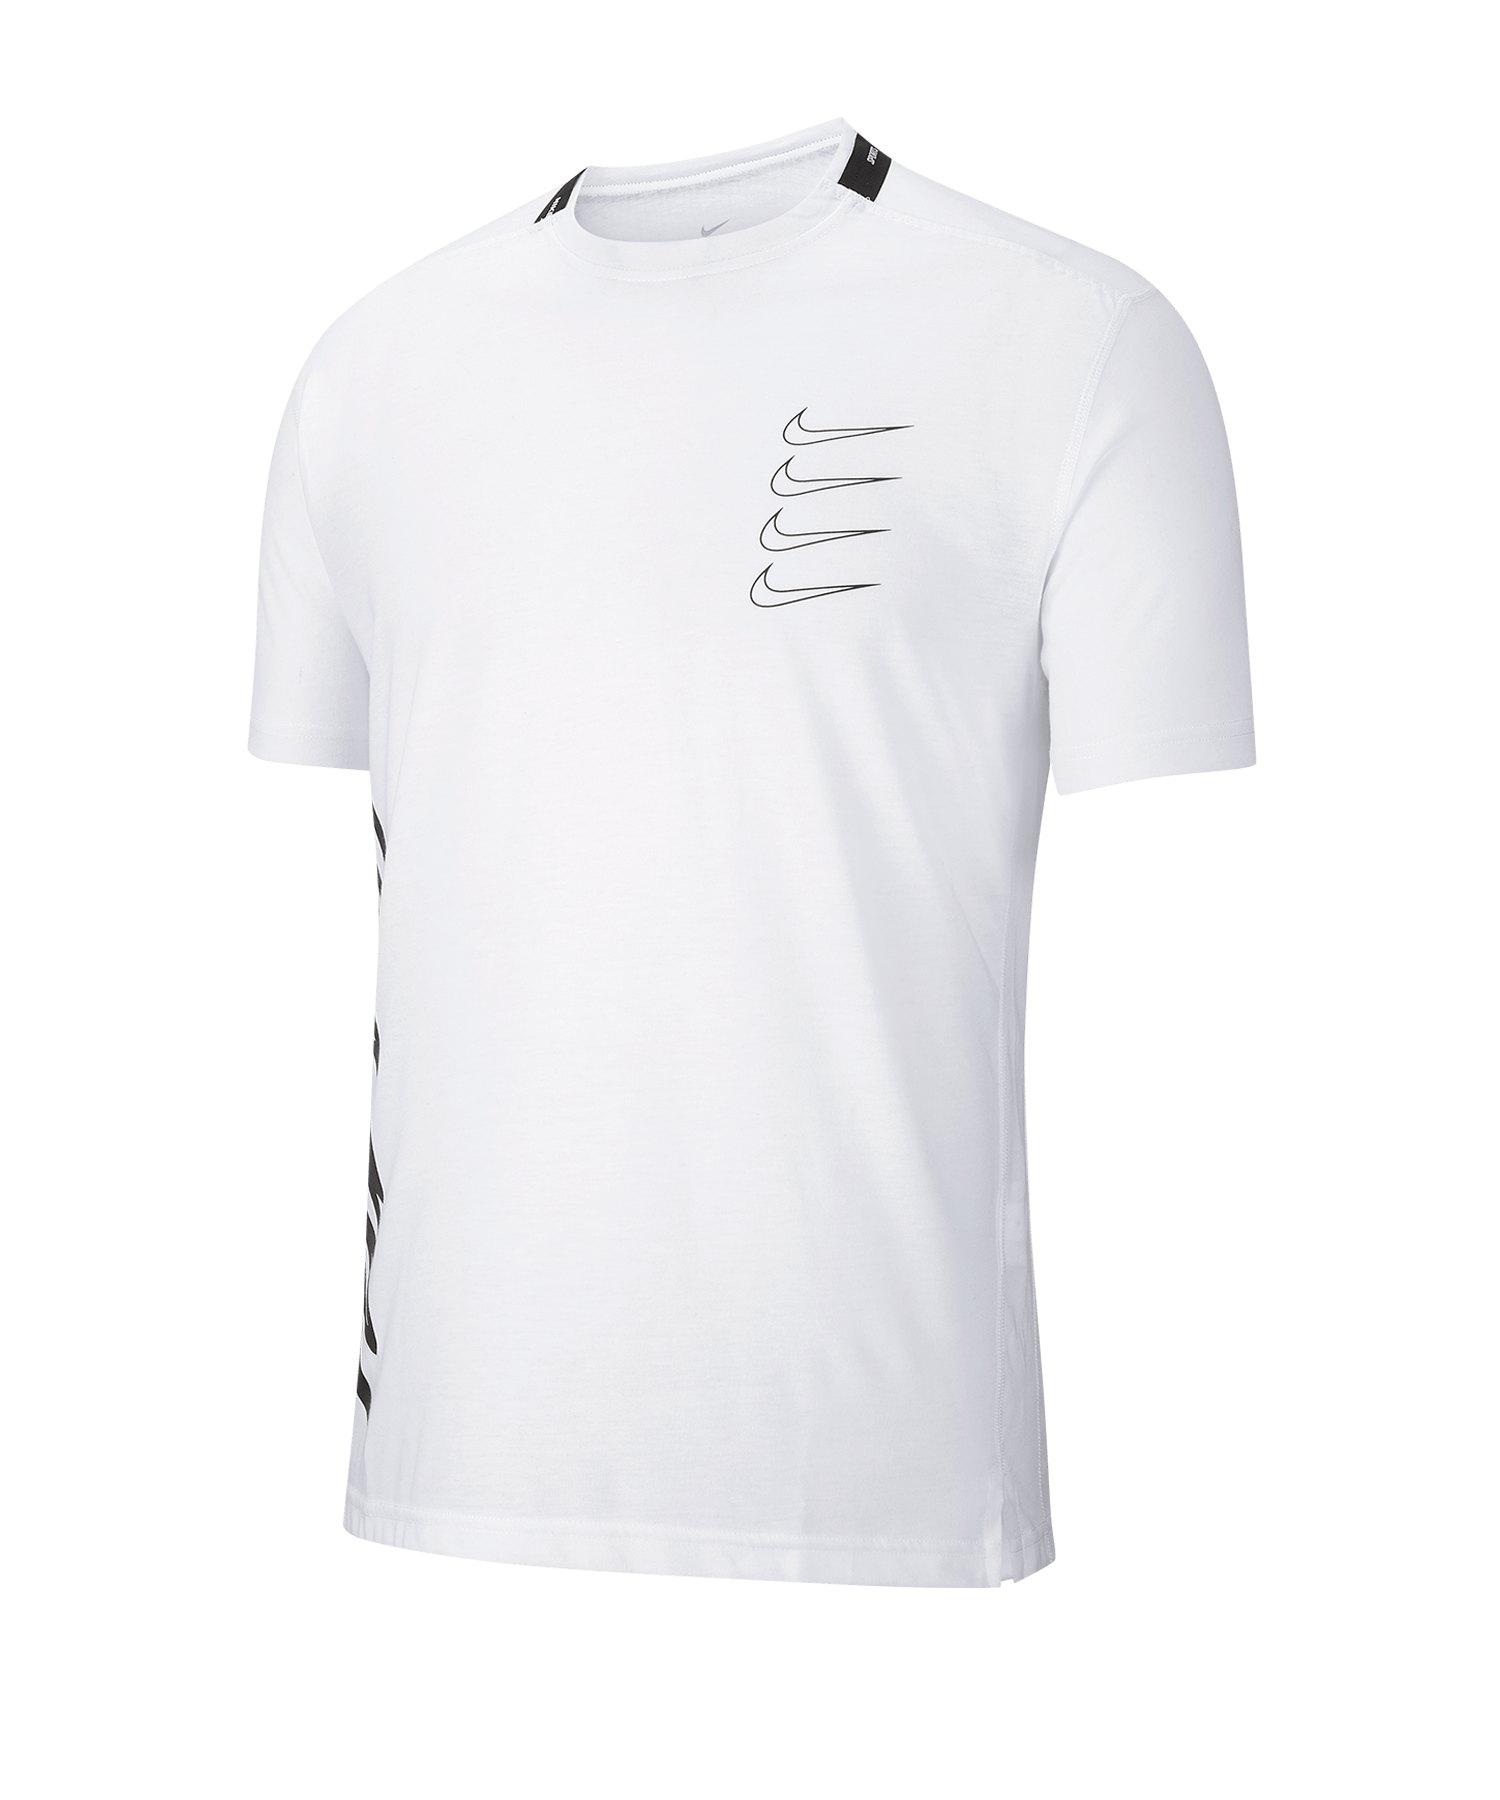 Nike Training T-Shirt Weiss F100 - weiss